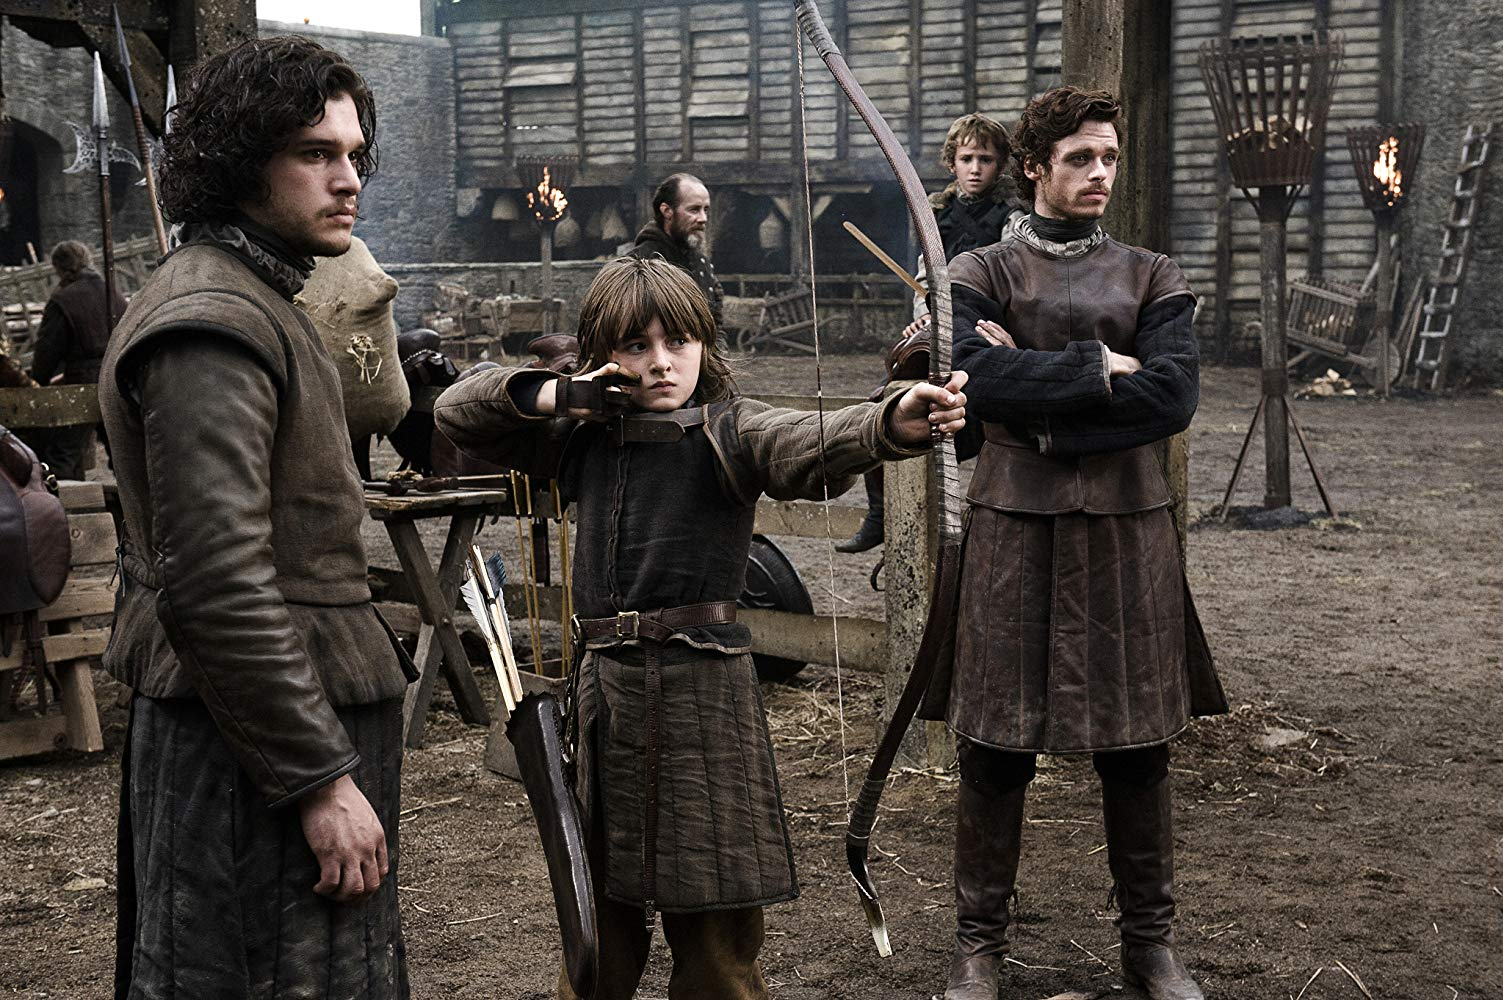 Jon, Bran, Robb, and Rickon